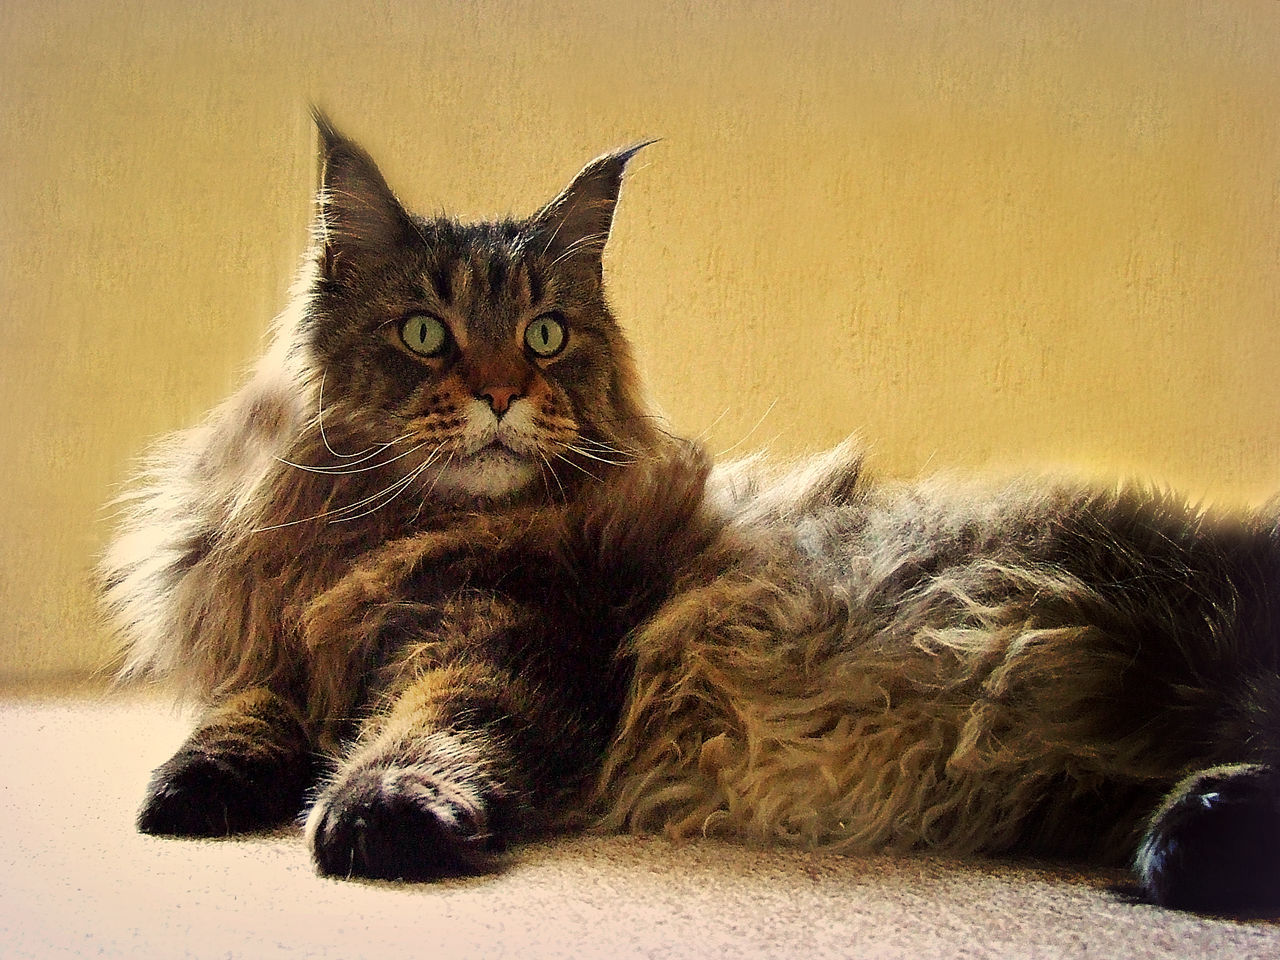 Cat Cat Lovers Cats Cats Of EyeEm Cats 🐱 Catslife Cat♡ Domestic Cat EyeEm I Love My Cat Mainecoon My Cat My Cats Pet Pet Photography  Pets Pets Of Eyeem